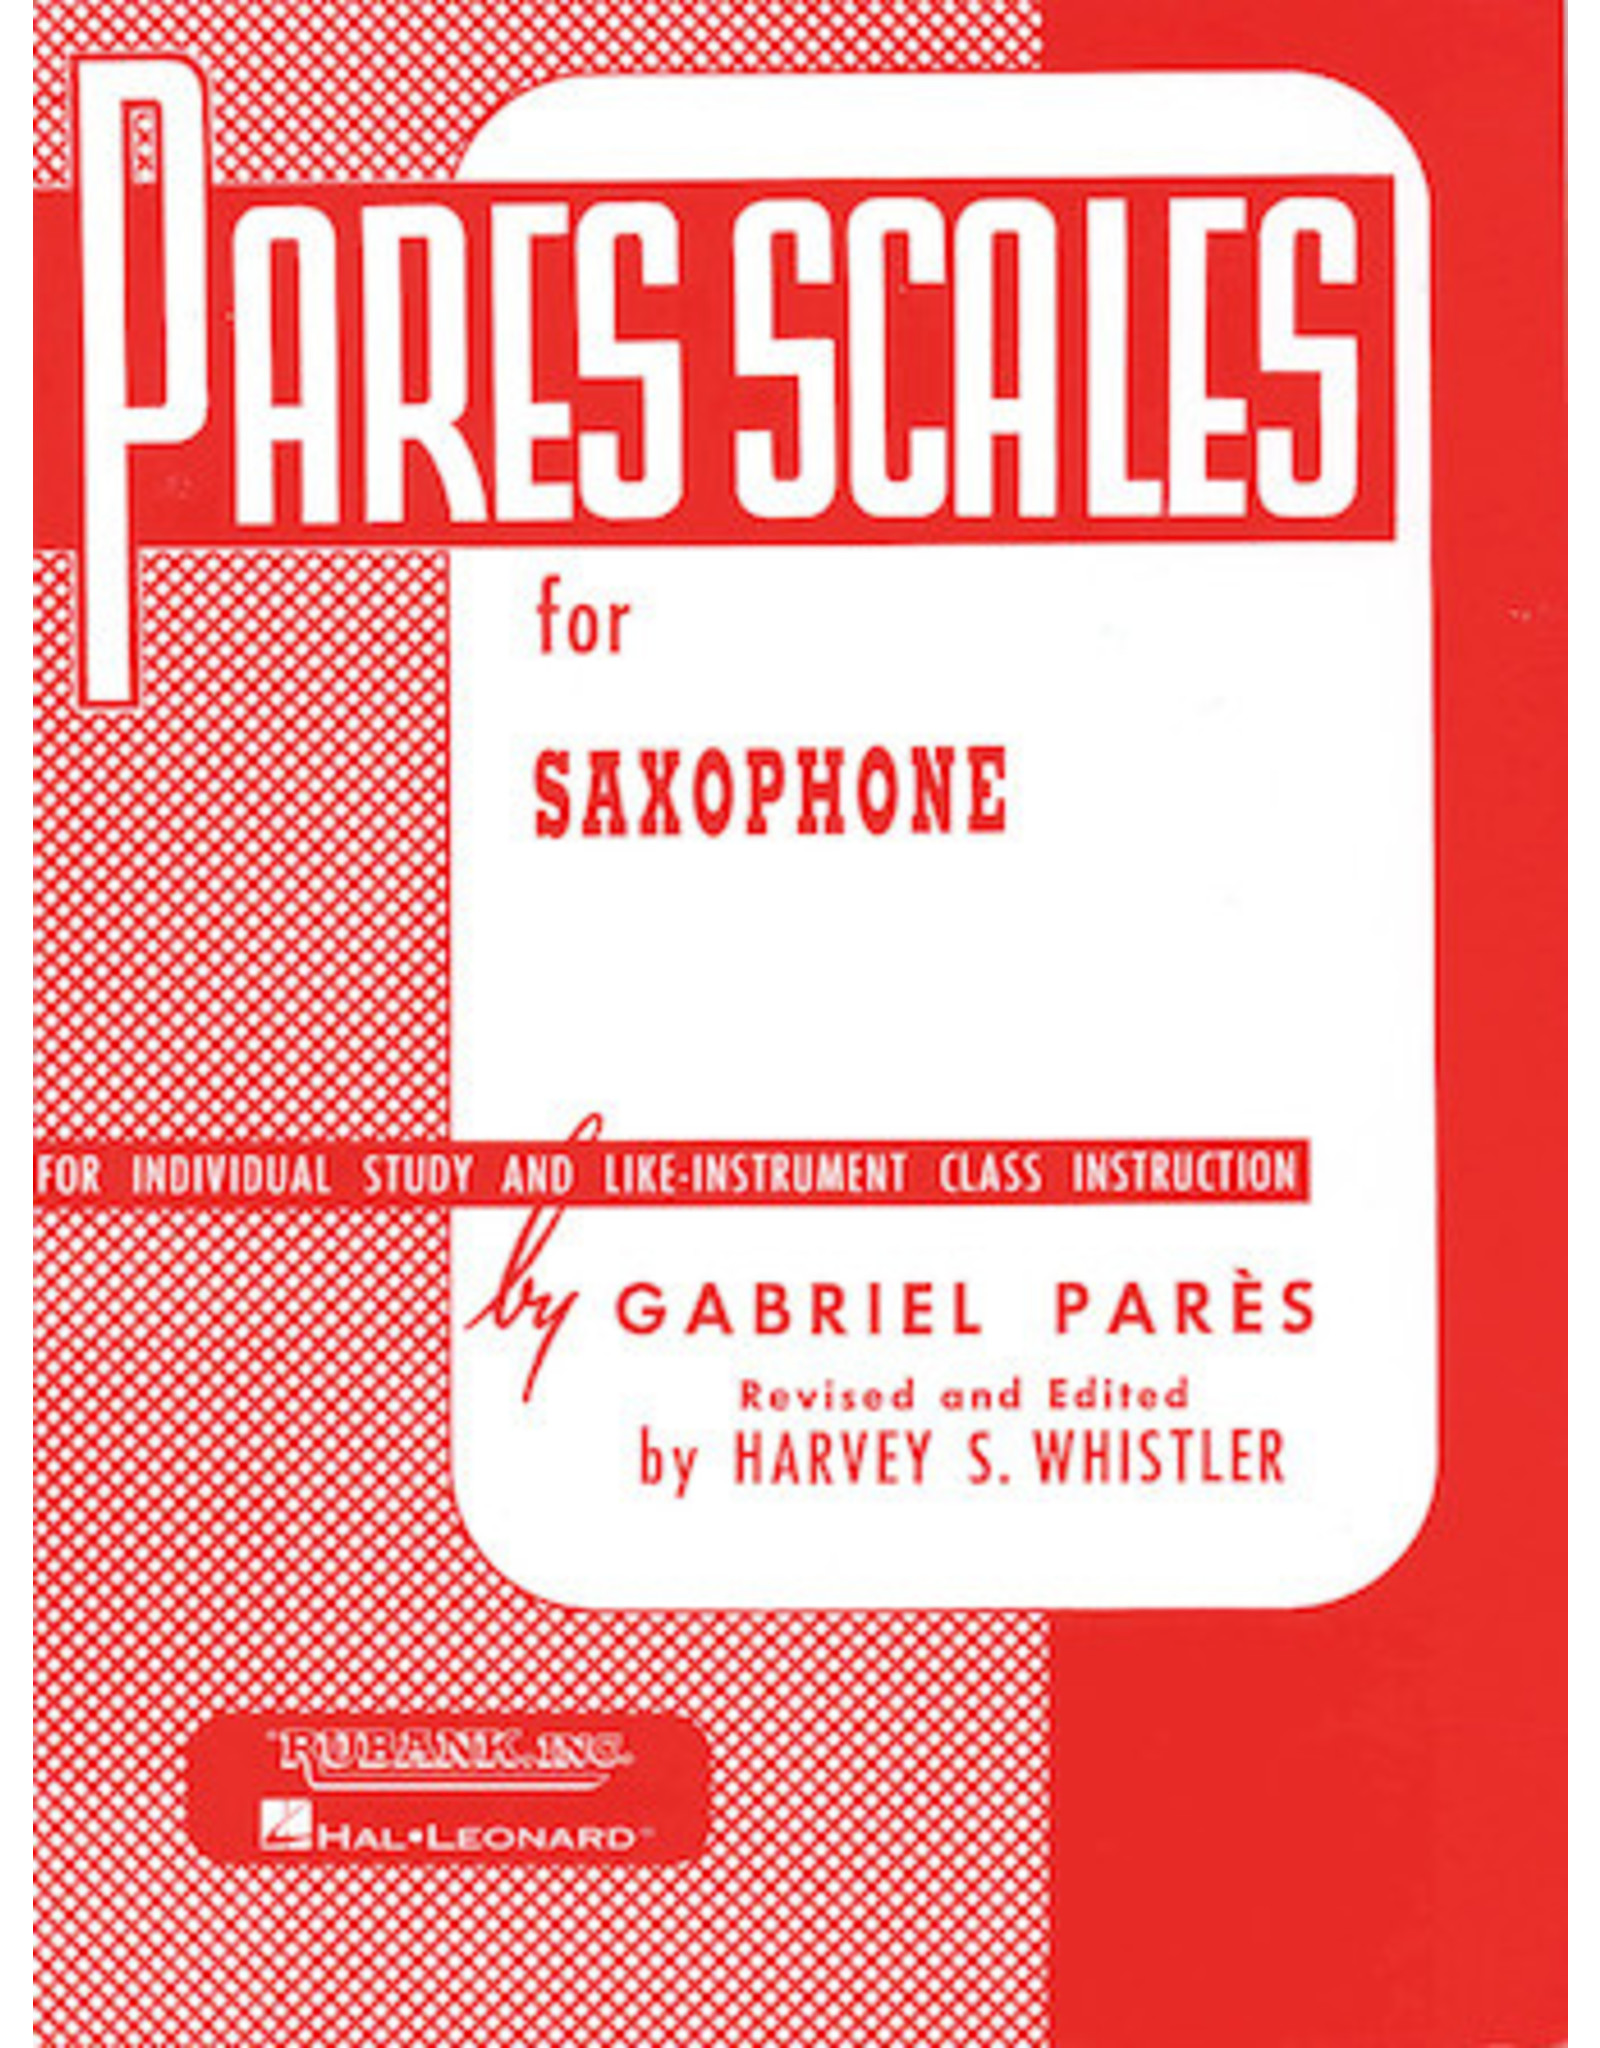 Hal Leonard Pares Scales Saxophone (Pares/rev. Whistler) Woodwind Method